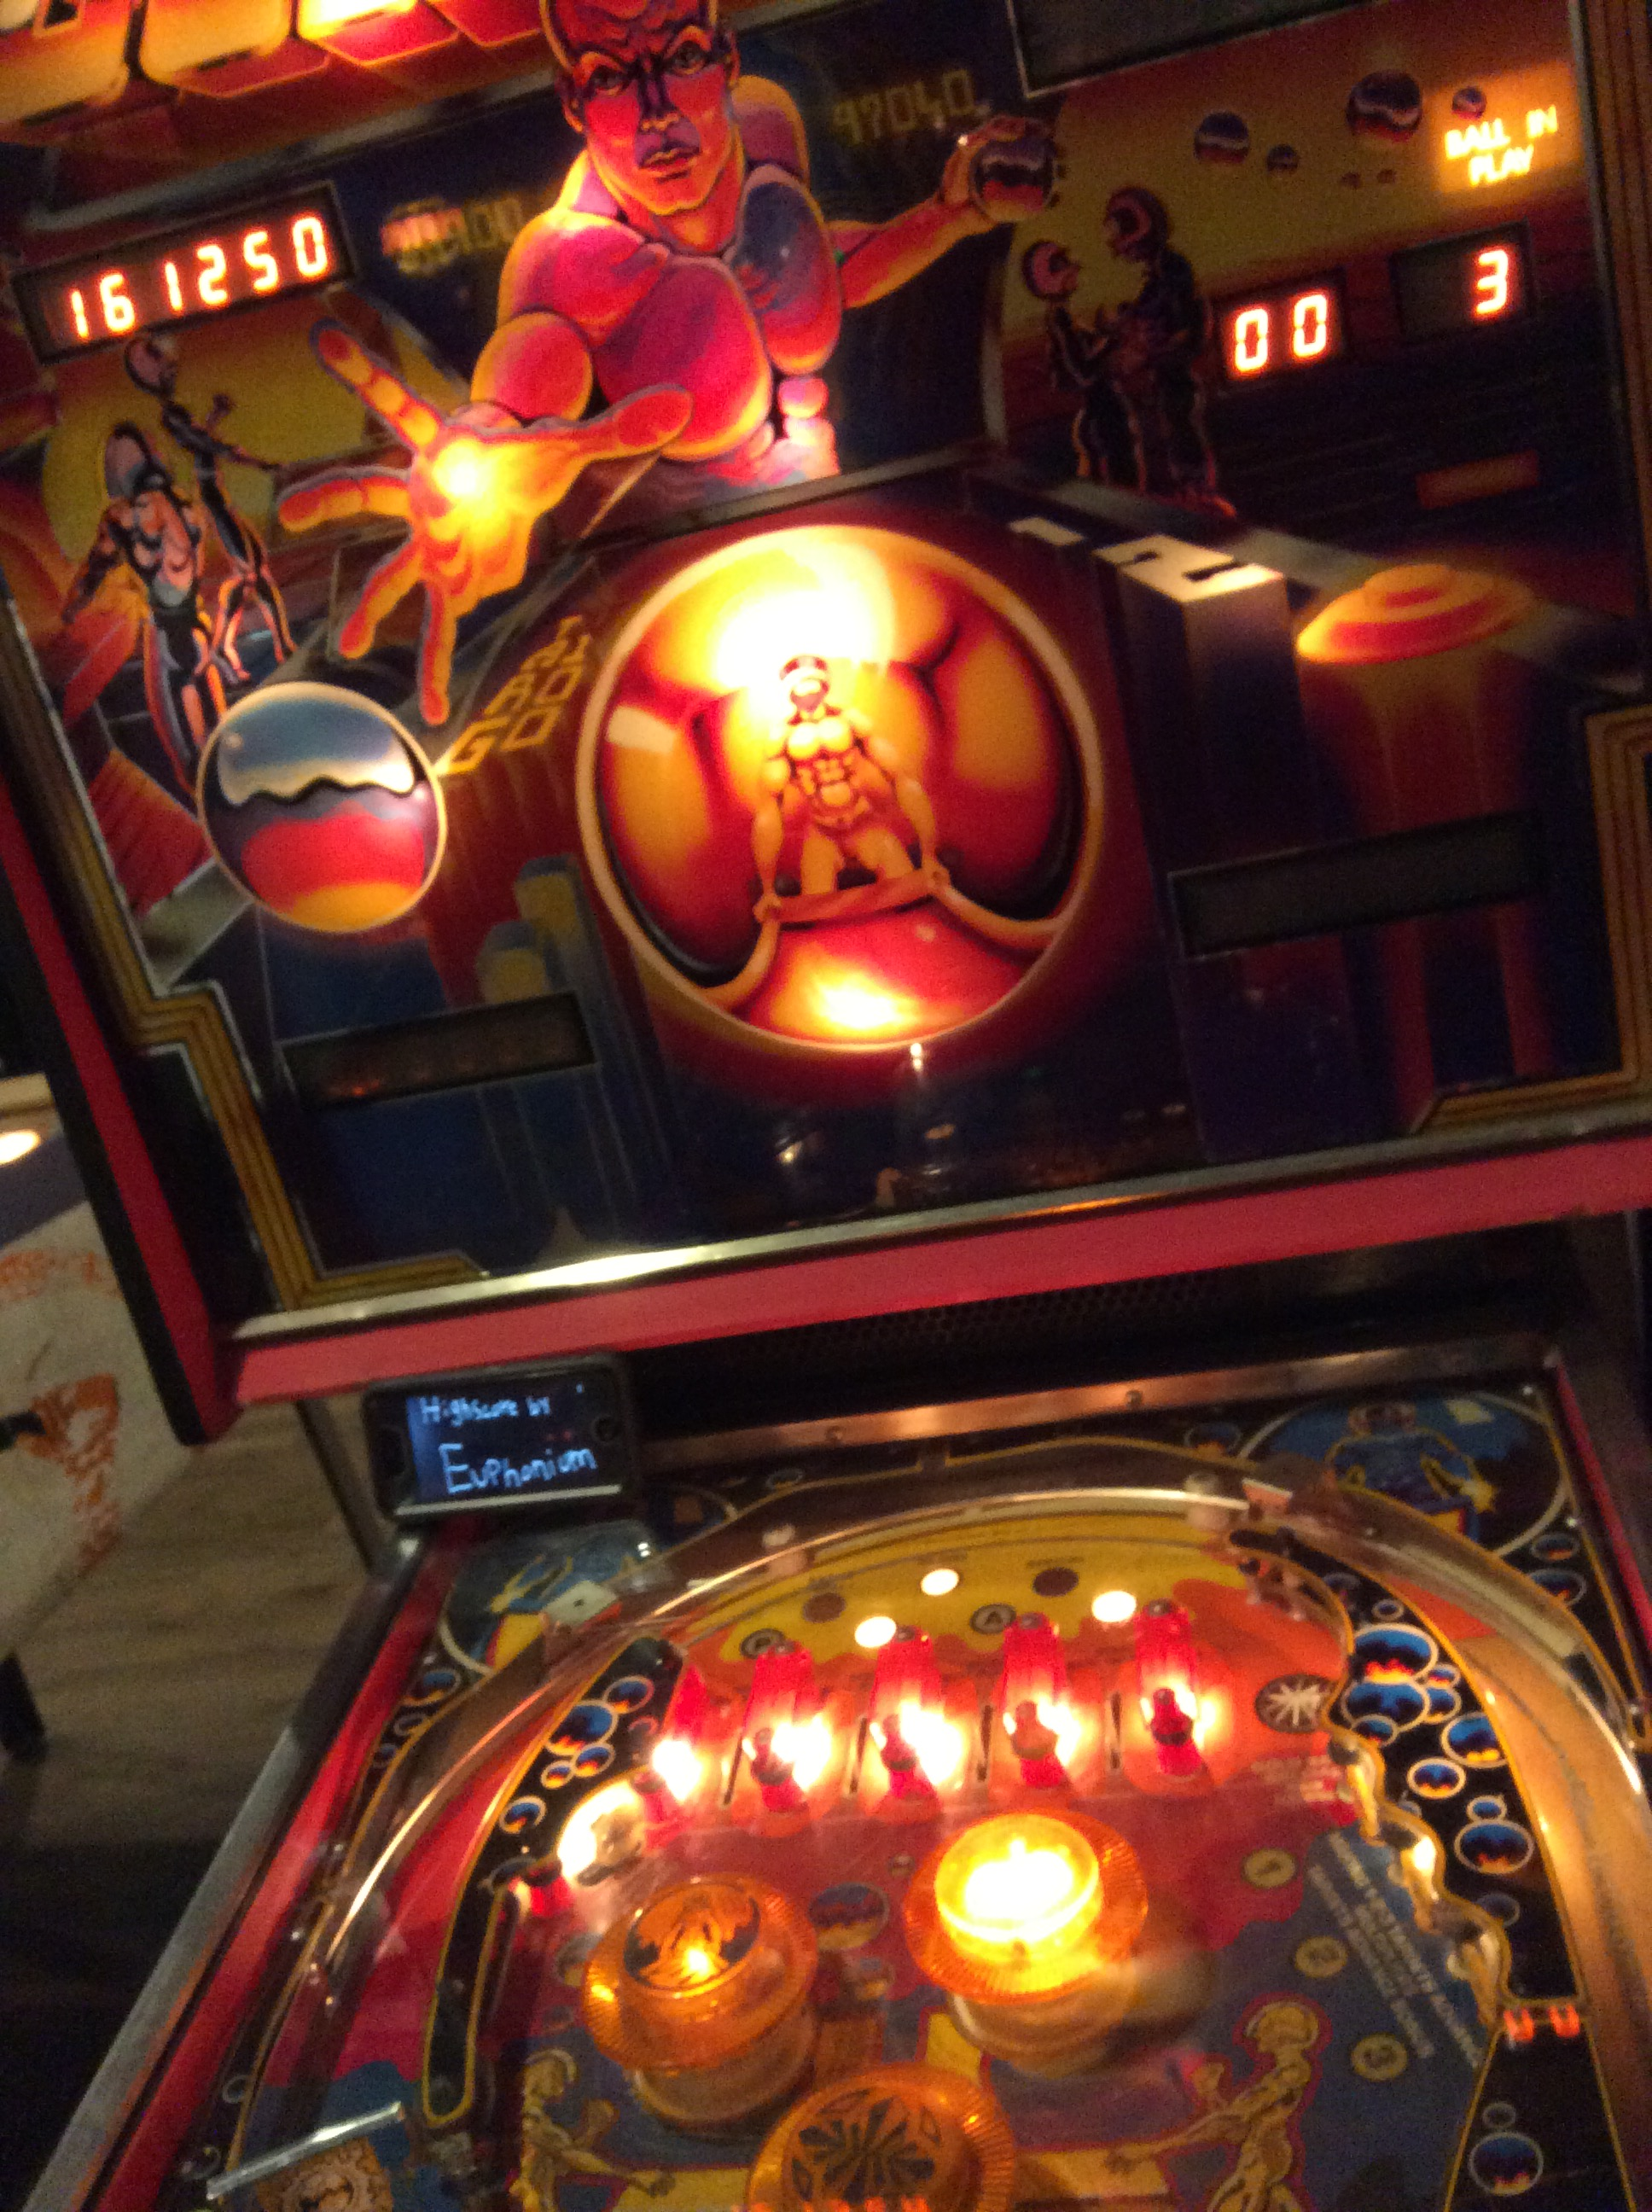 euphonium: Gold Ball (Pinball: 3 Balls) 161,250 points on 2016-08-31 08:06:01